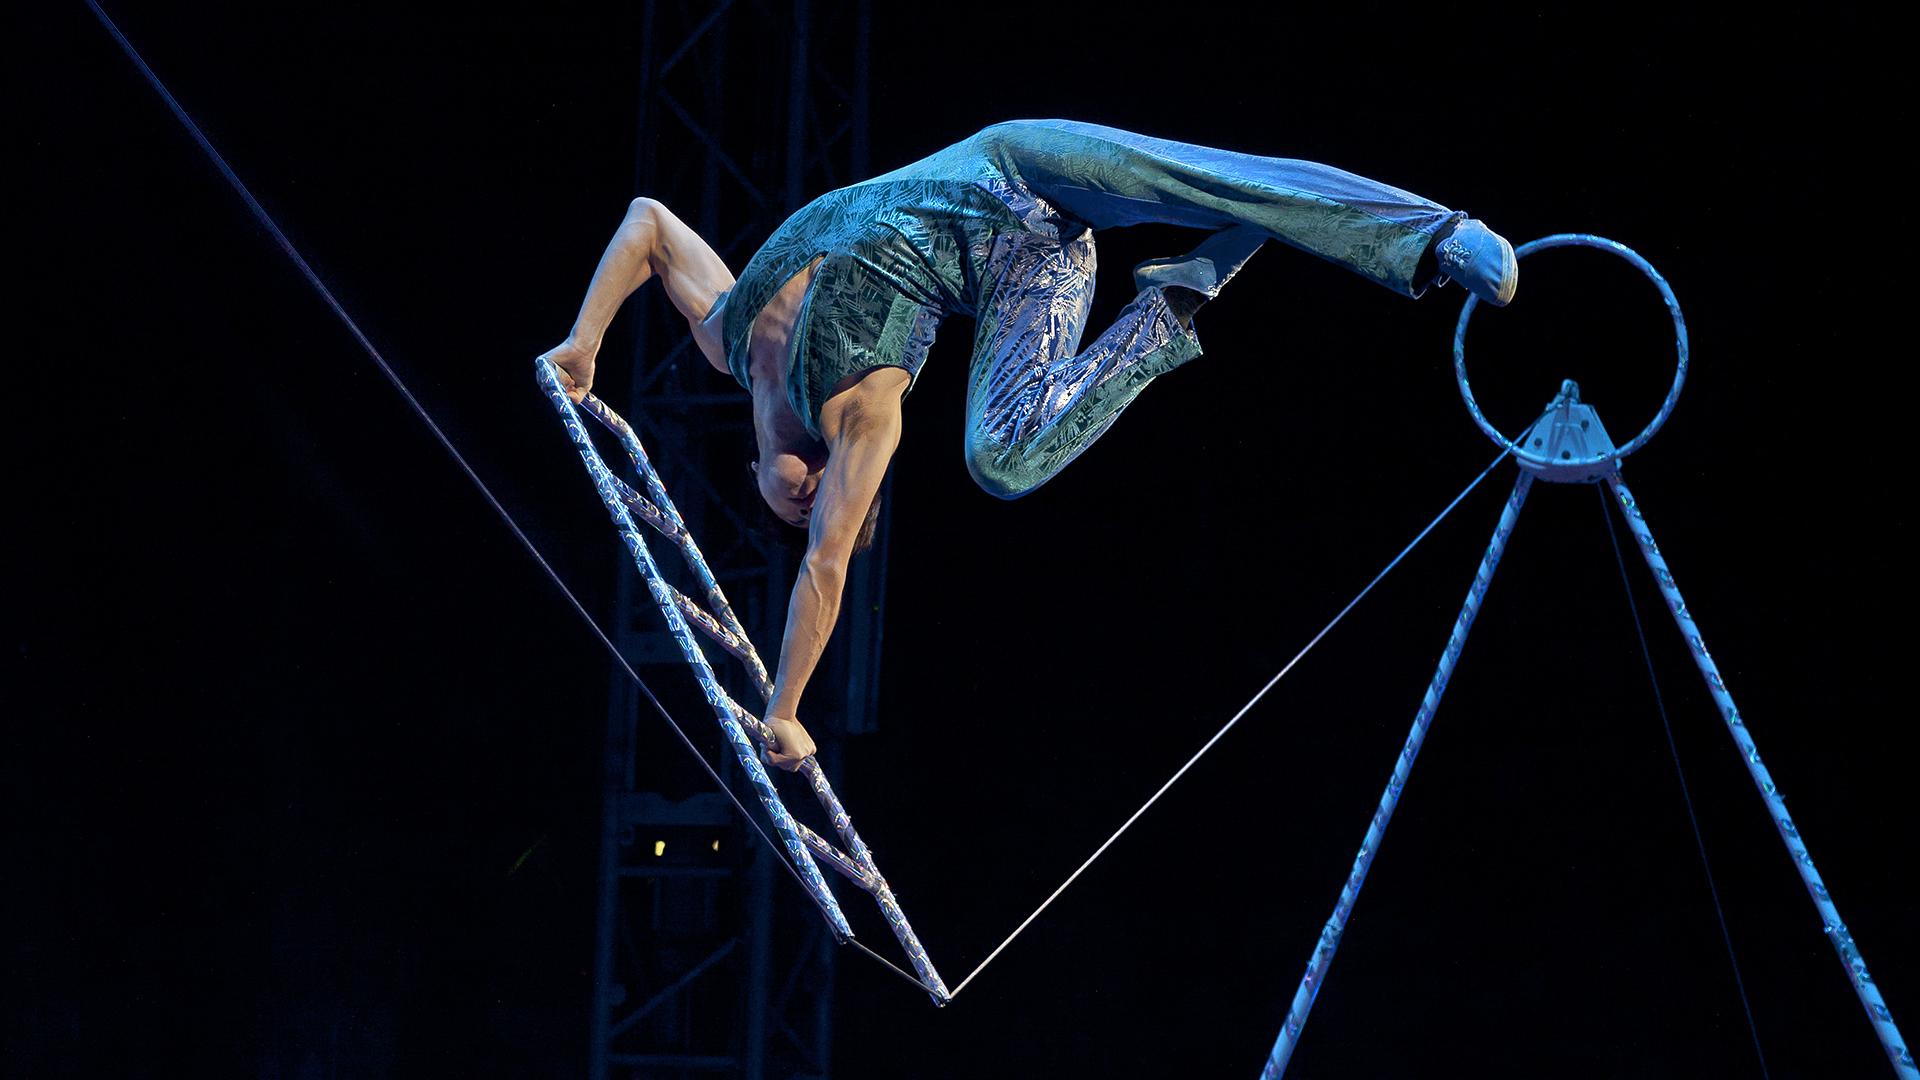 ZHANG FAN - Meister auf dem Seil